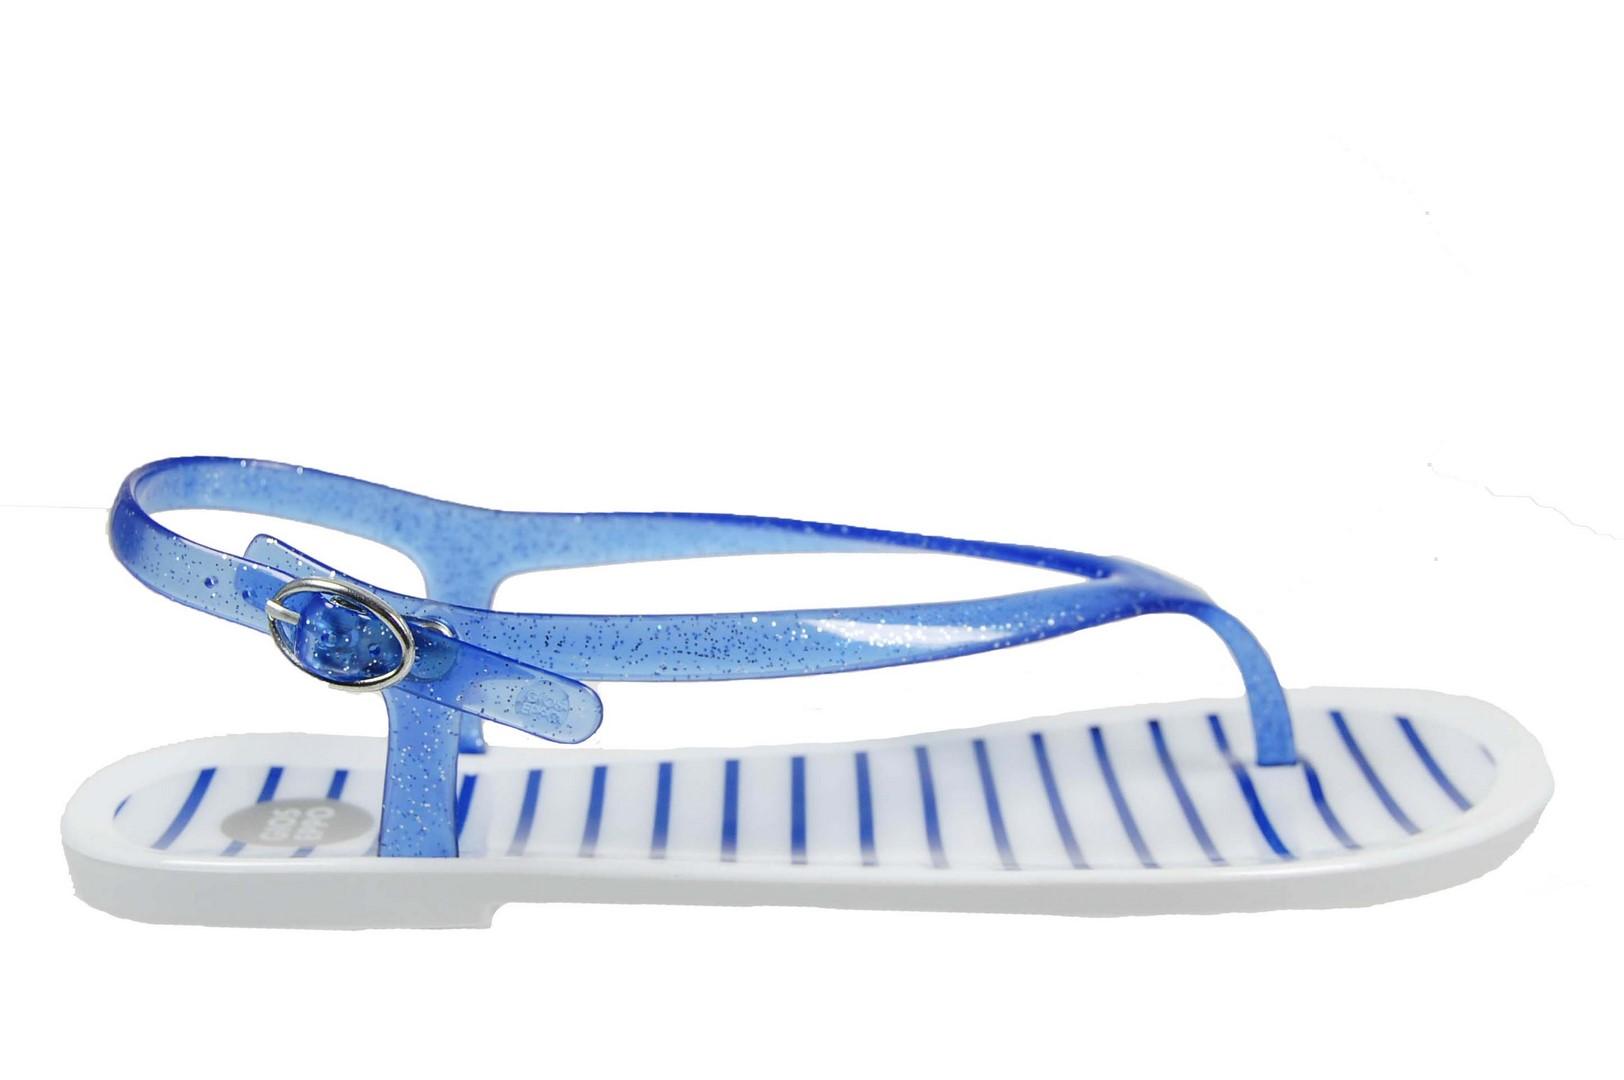 565afcafaecc GIOSEPPO 31438 SASSARI - sandały niebieskie 39 - 6873466744 ...